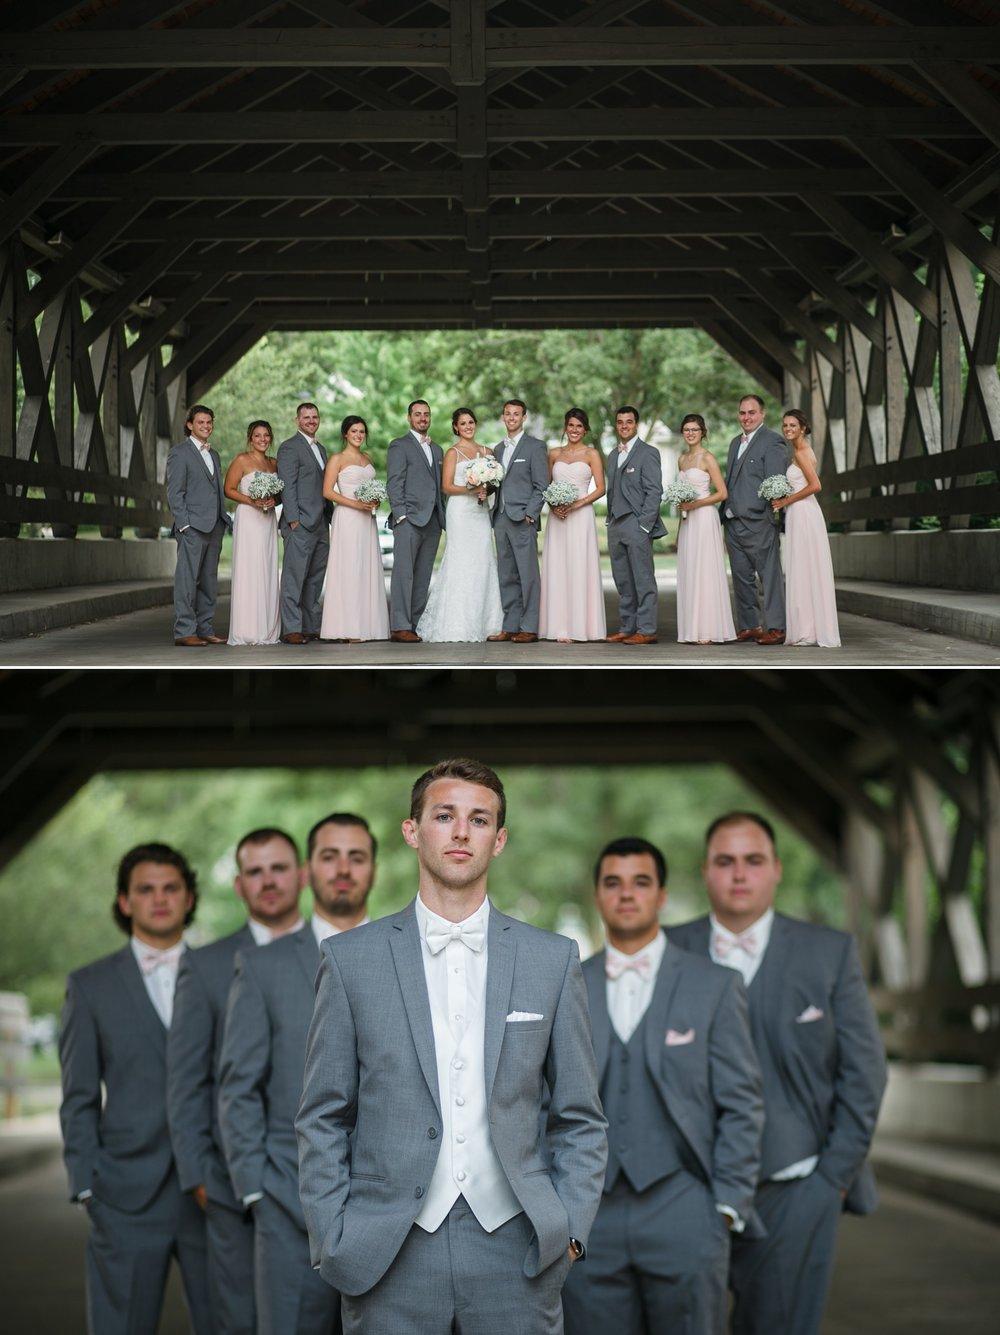 Highland-meadows-wedding-photos 40.jpg